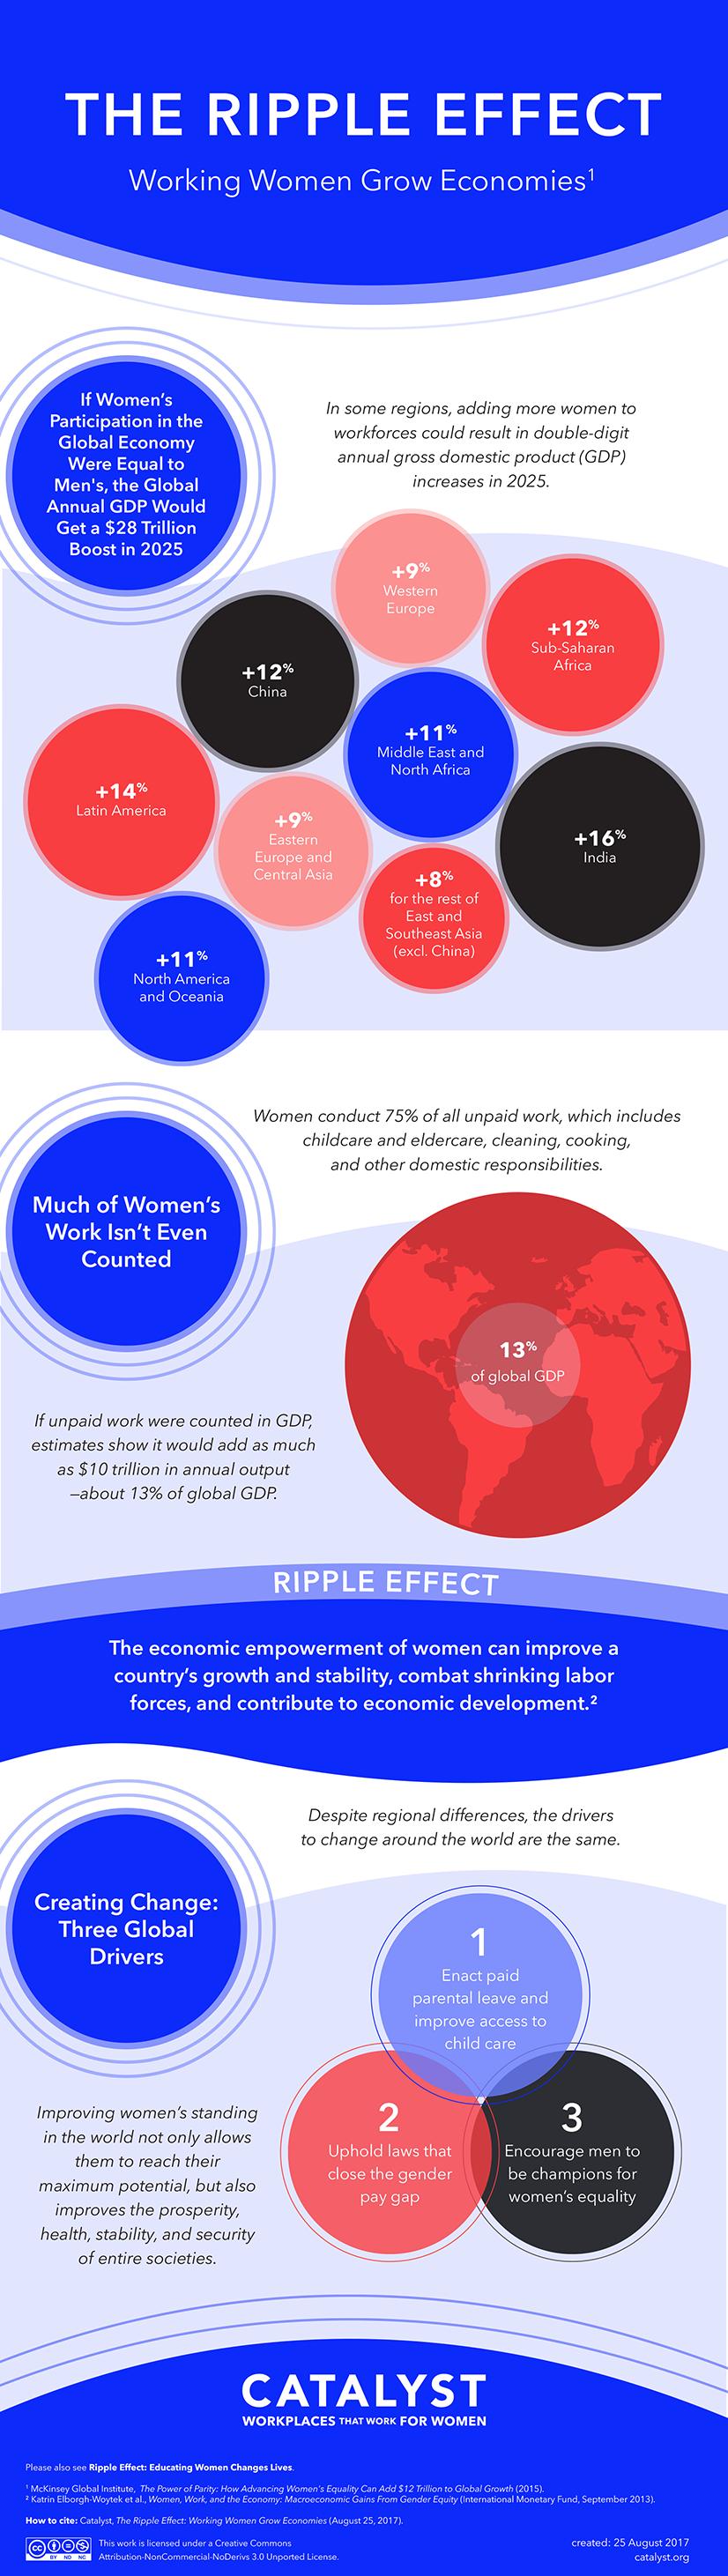 The Ripple Effect - Working Women Grow Economies